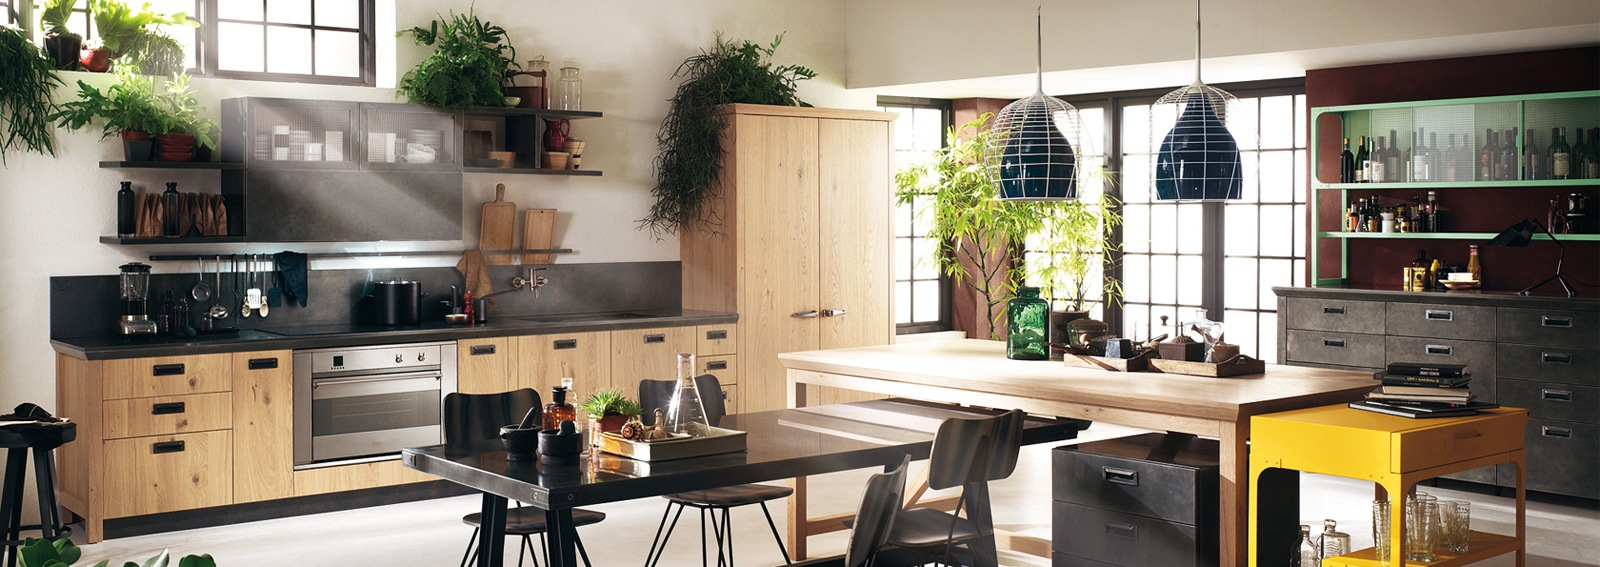 Stile industriale le cucine pi belle for Cucina italiana mobili